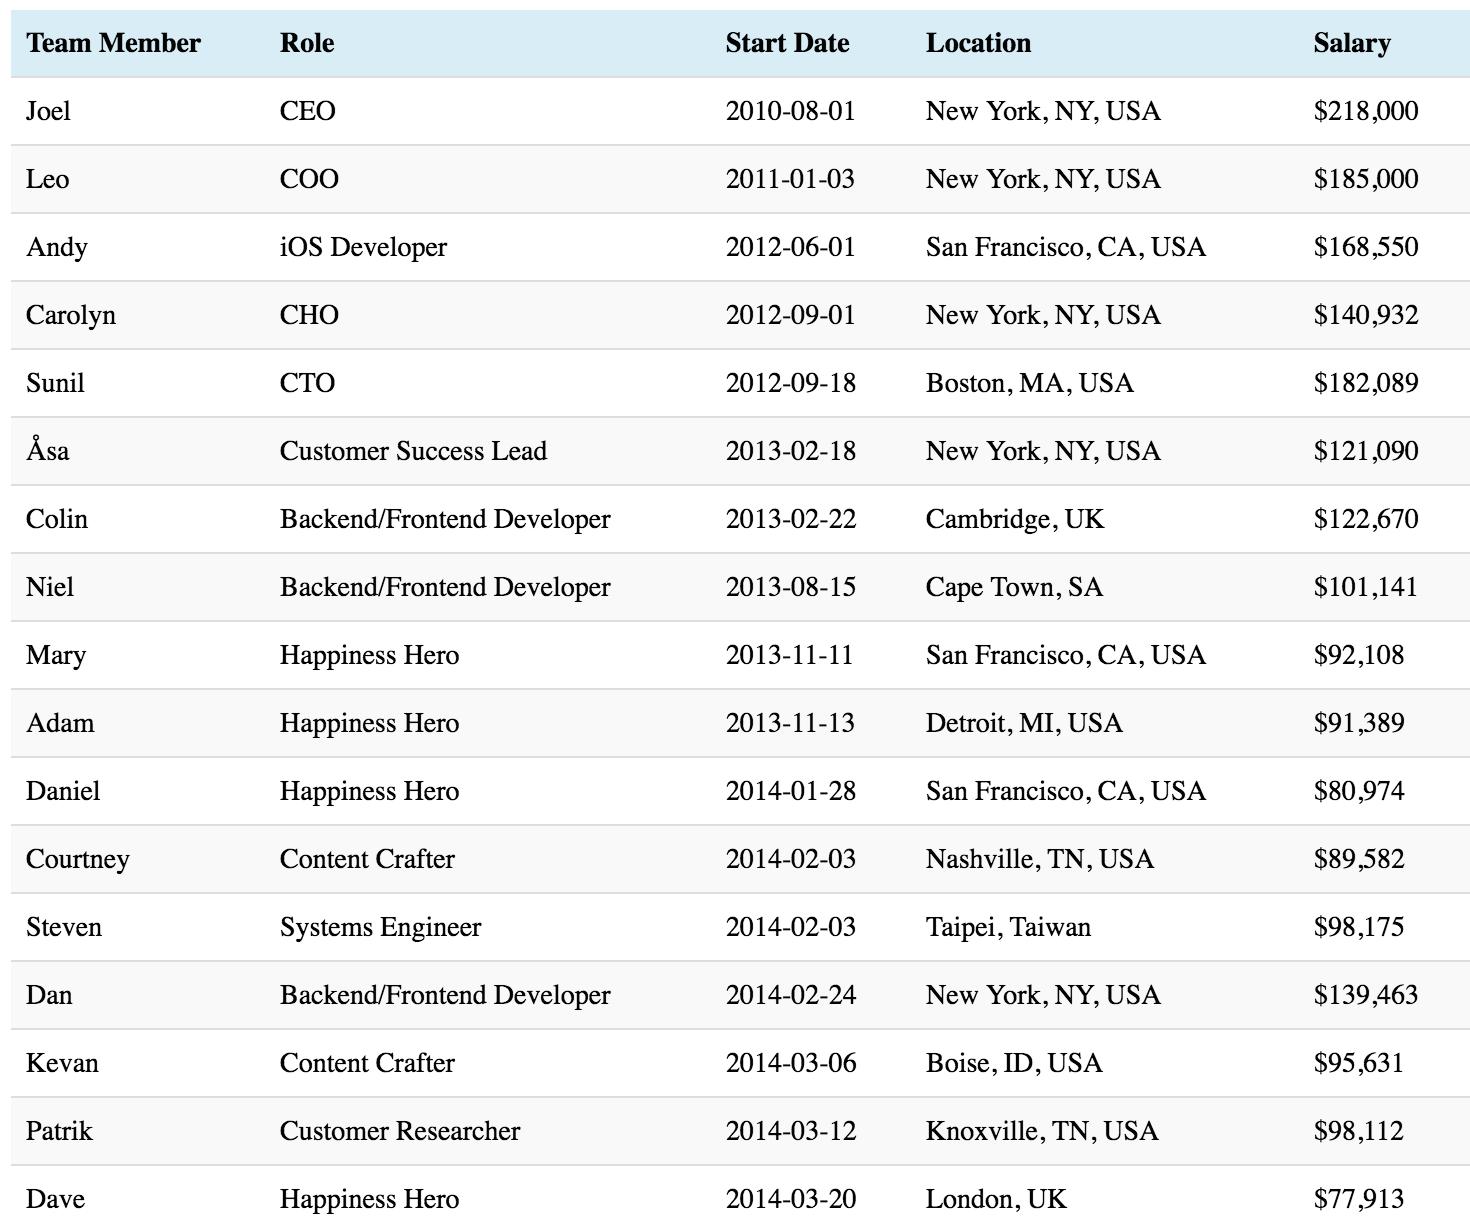 Buffer app salaries